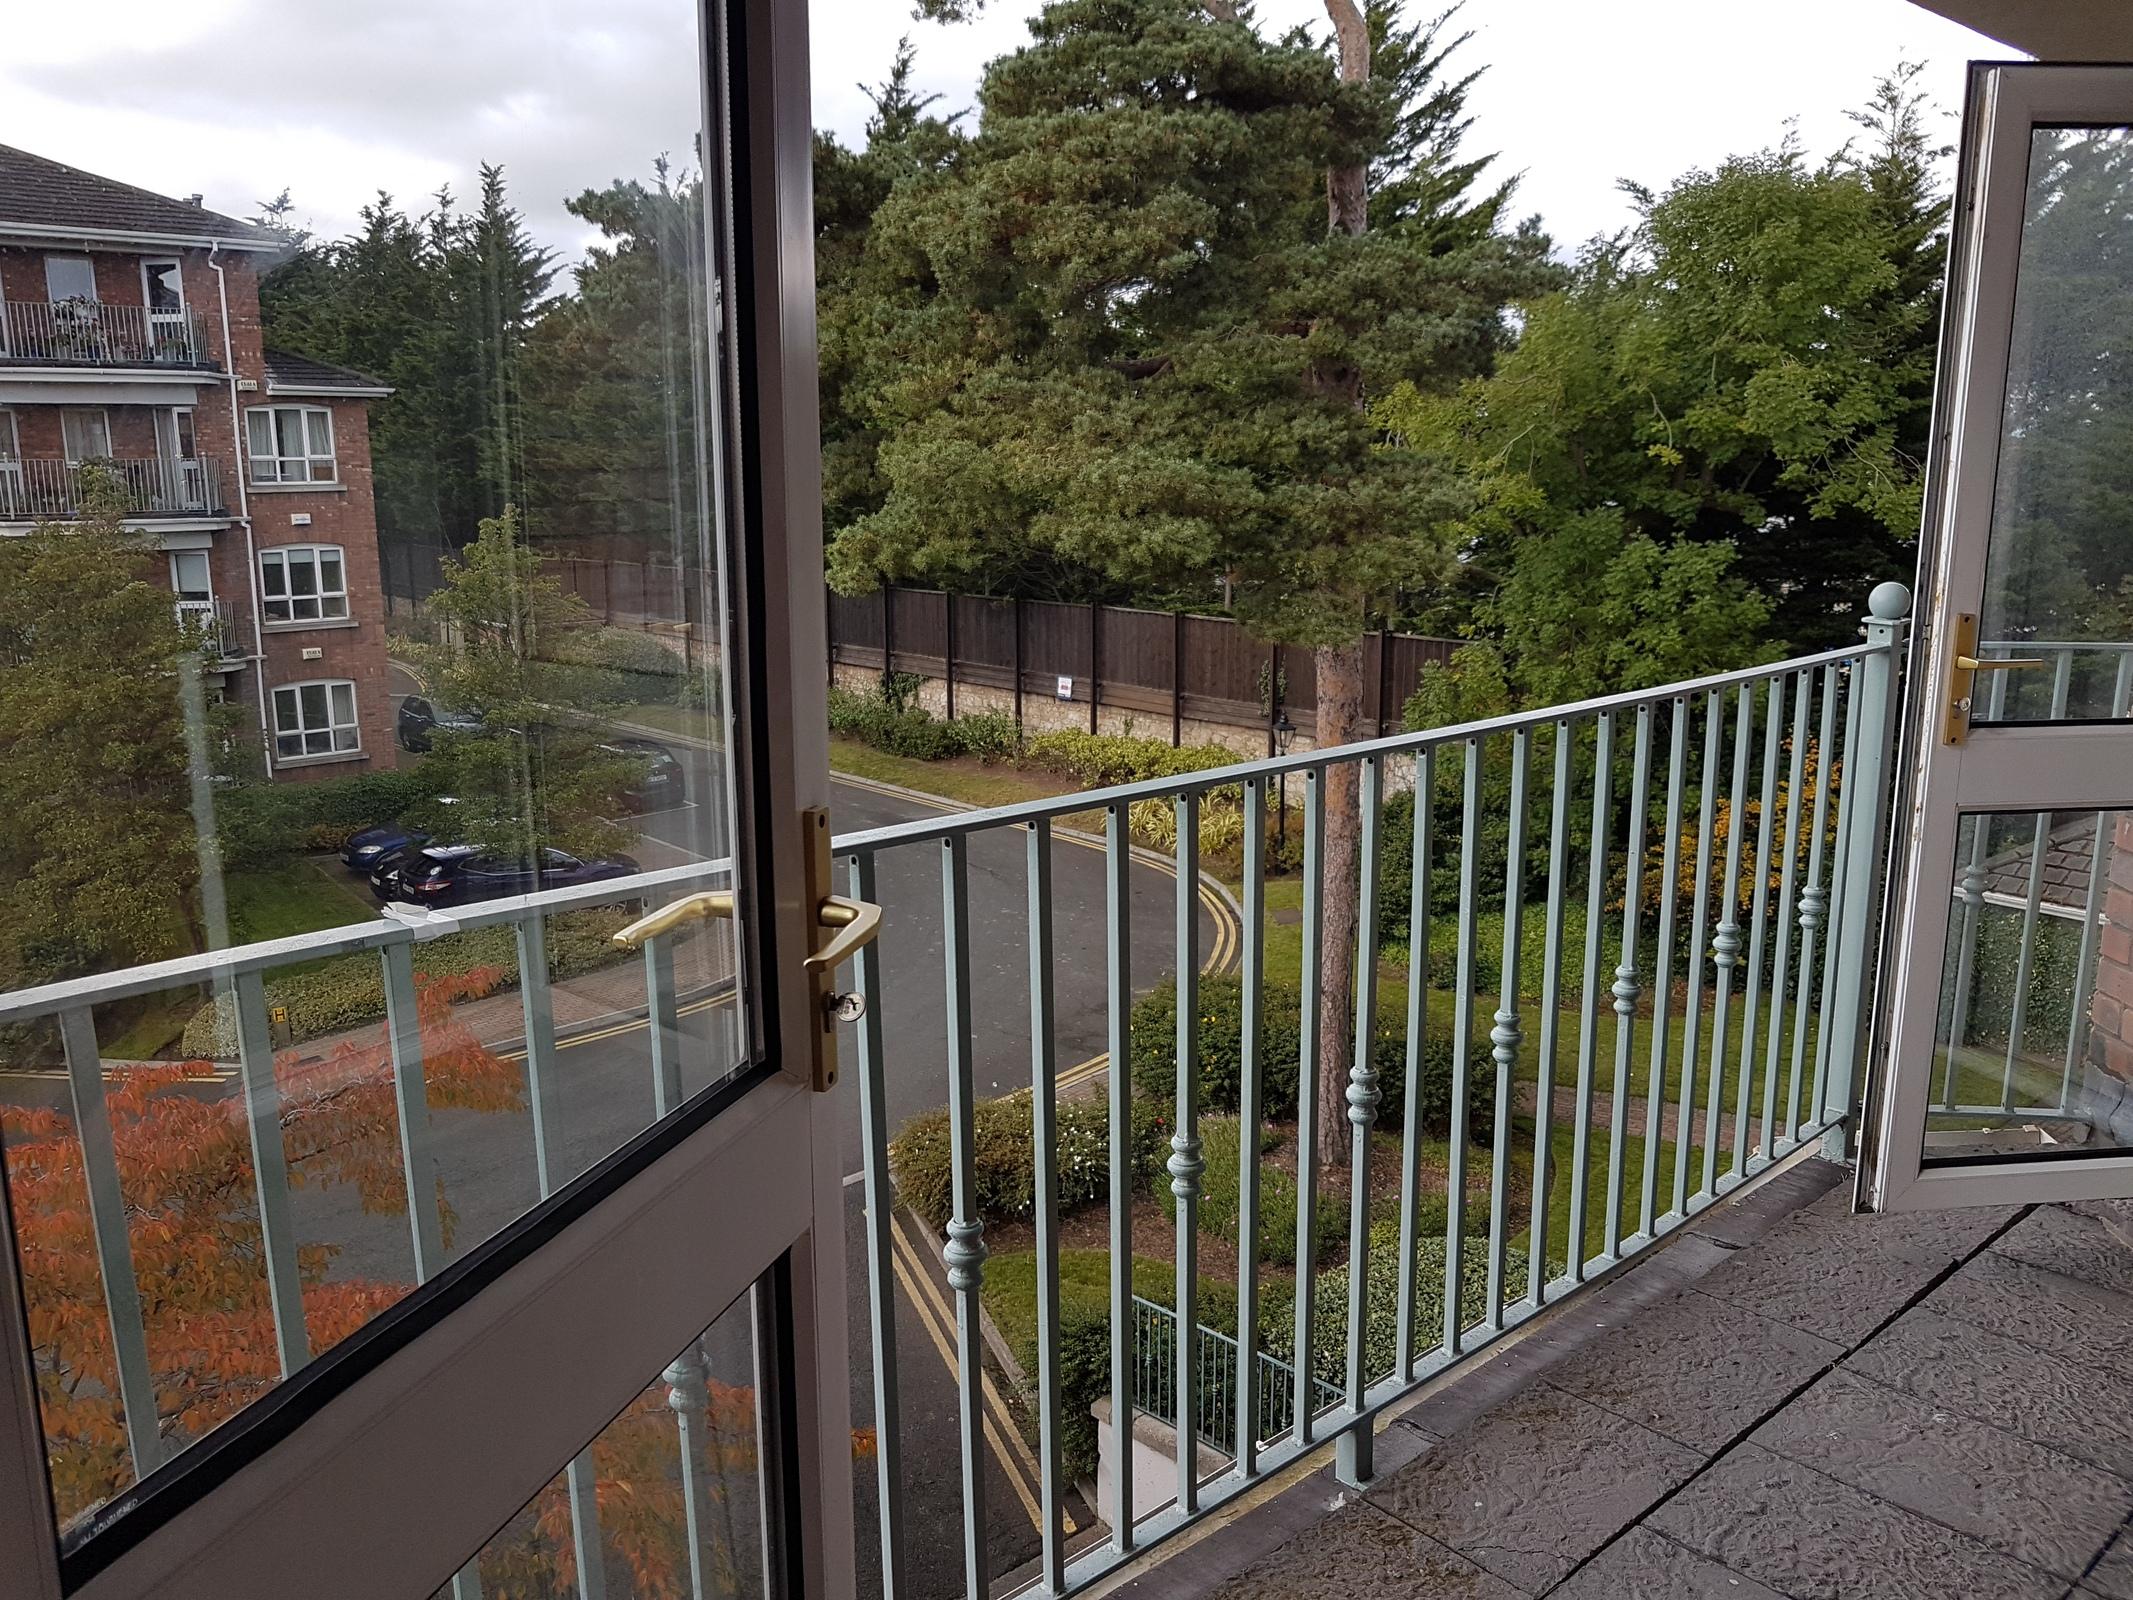 Apartment 21, Ailesbury, Donnybrook Castle, Donnybrook, Dublin 4